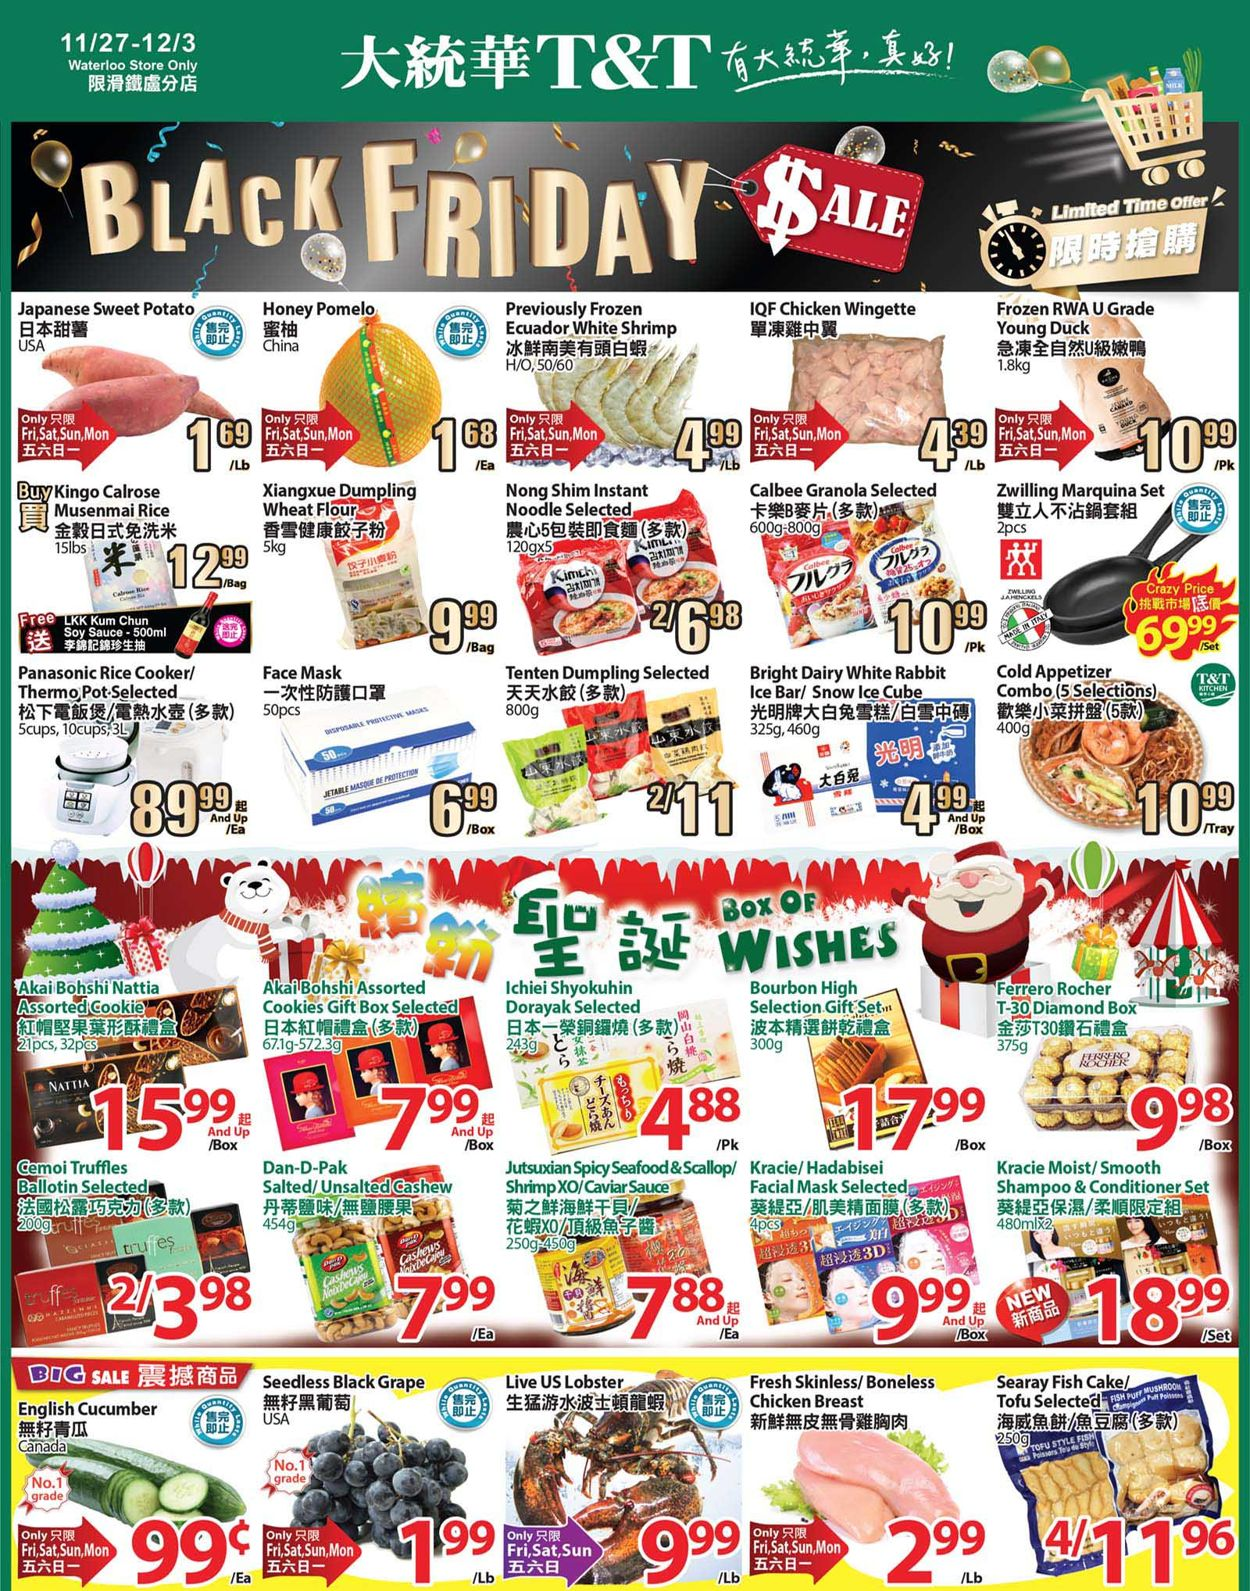 T&T Supermarket Black Friday 2020 - Waterloo Flyer - 11/27-12/03/2020